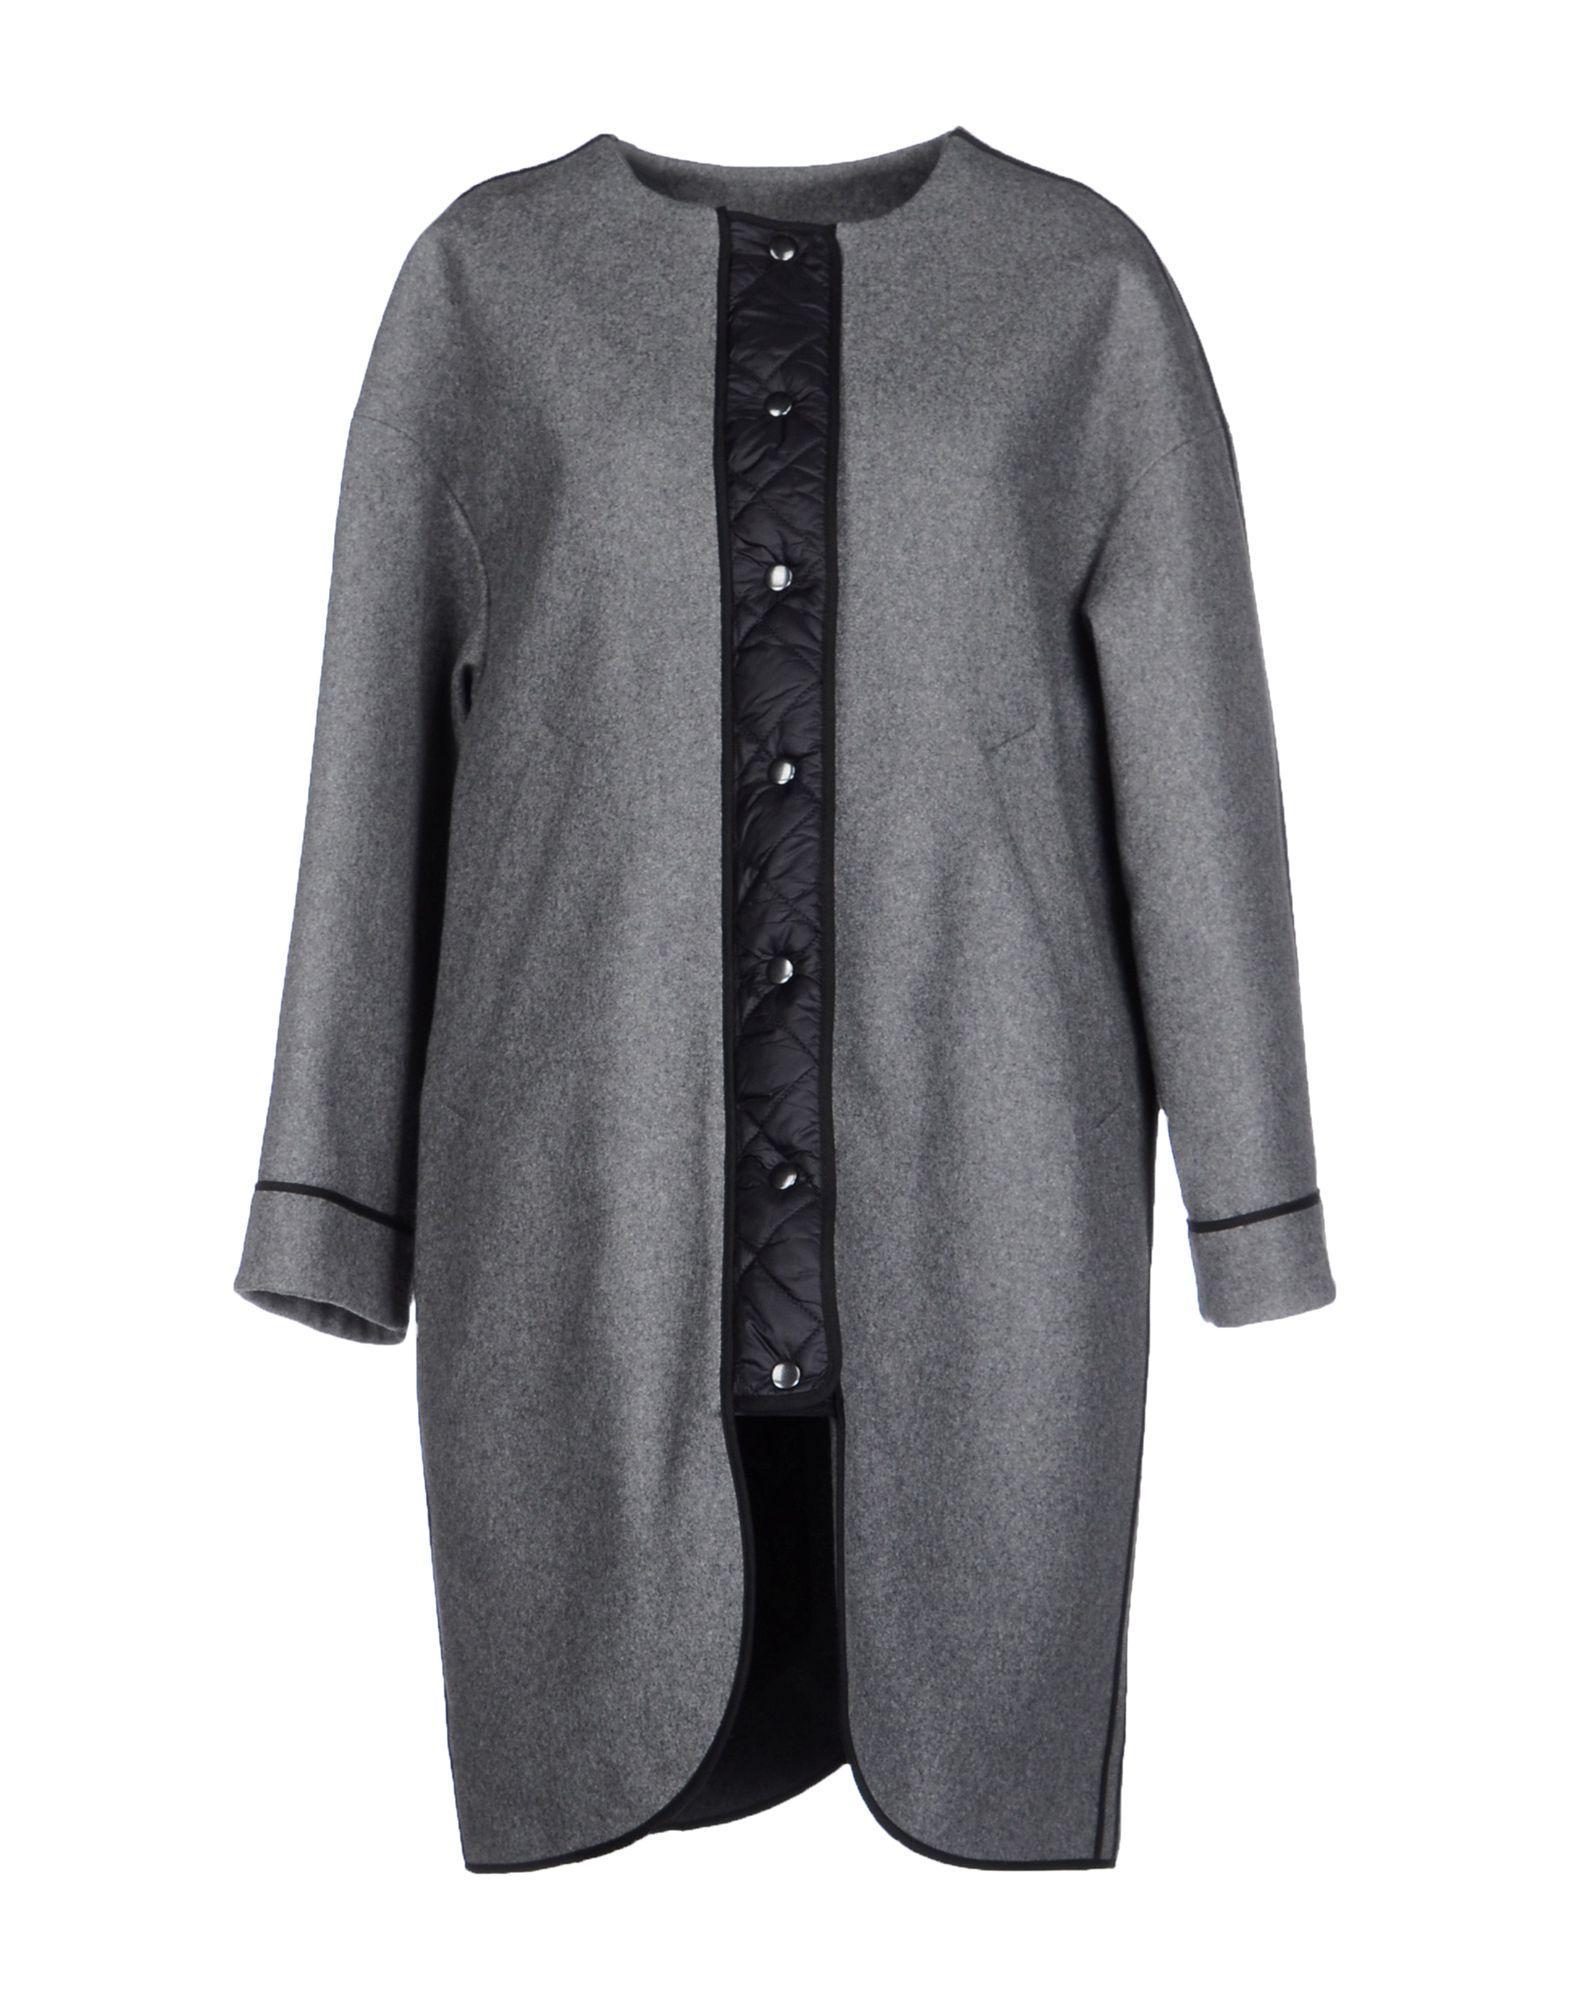 Sonia By Sonia Rykiel Coat In Grey